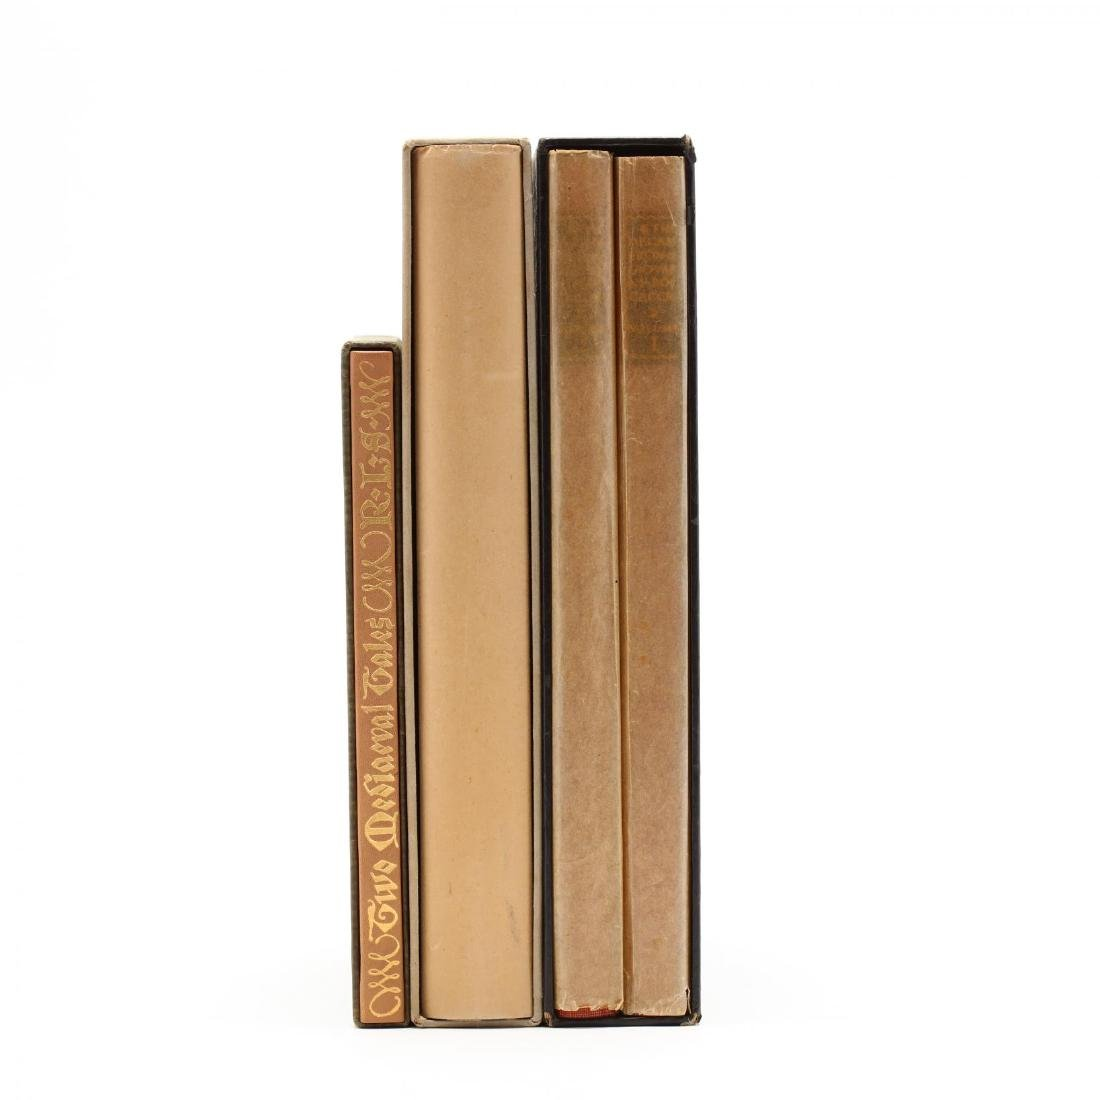 Three Prewar Limited Editions Club Slipcased Books With - 2